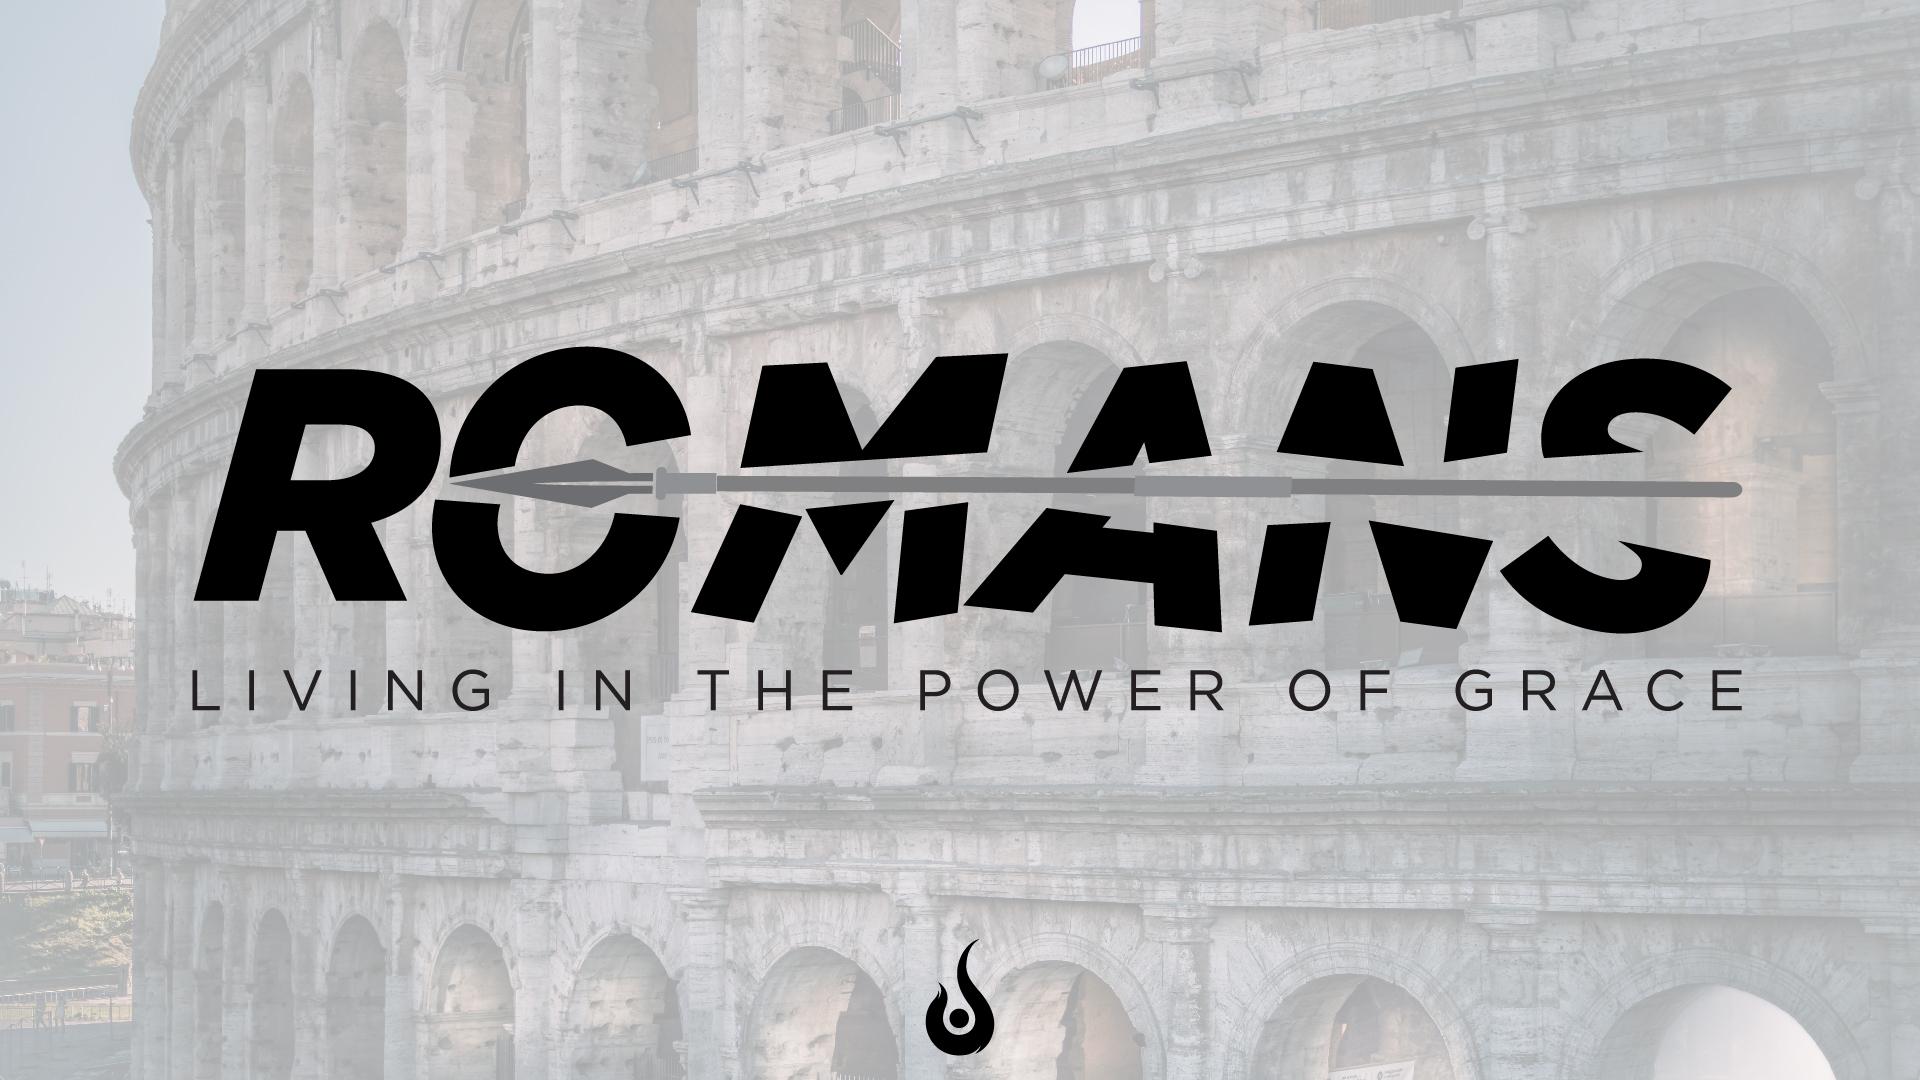 ROMANS-2019-01.jpg